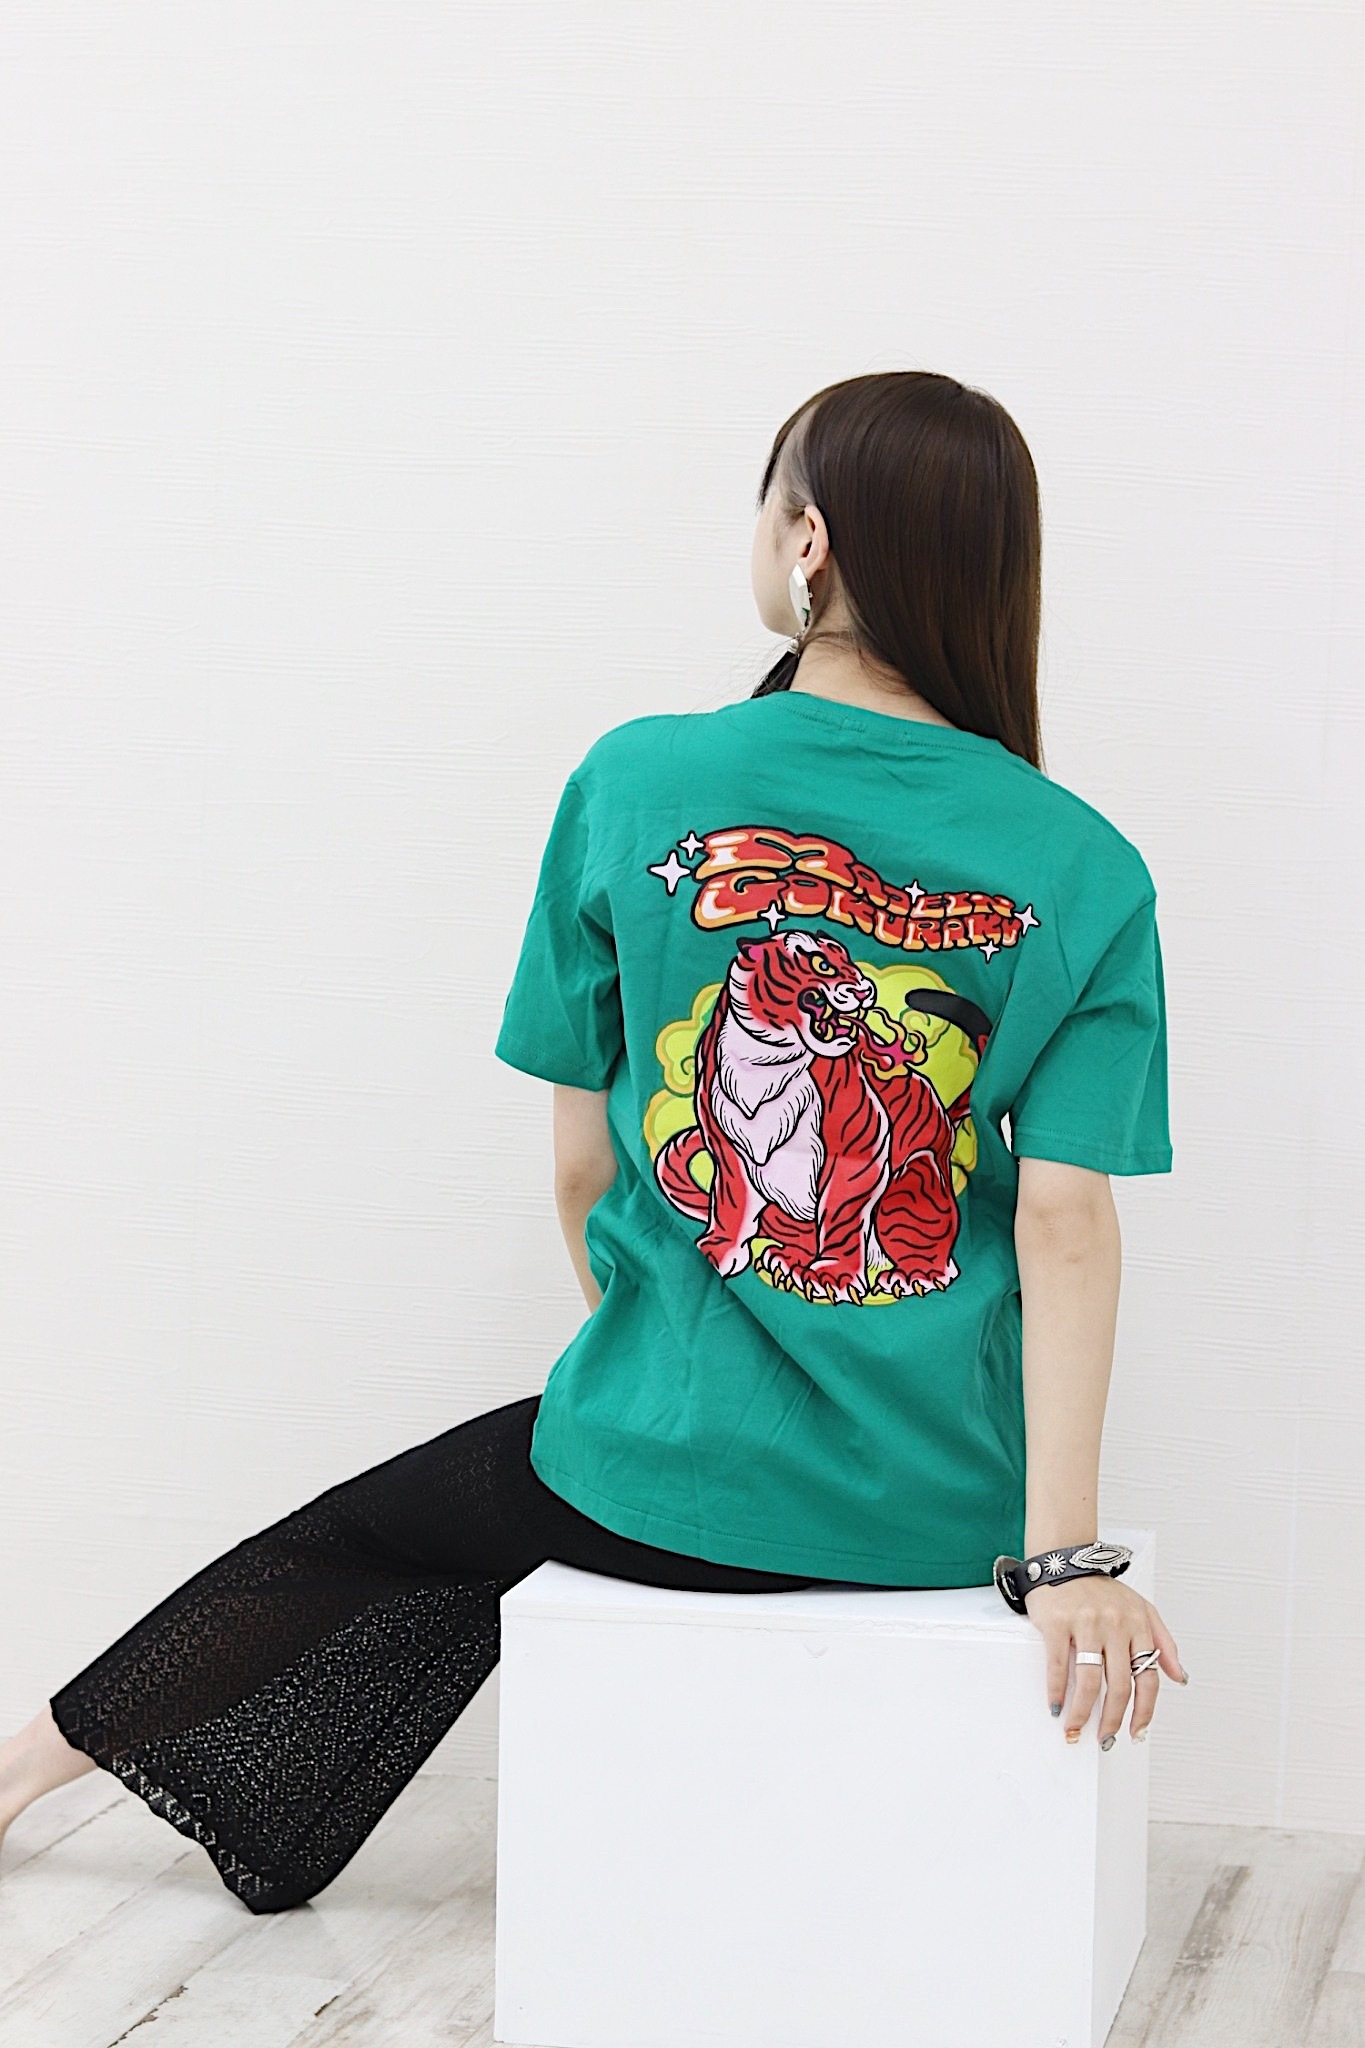 【unisex】MAID in 極楽 T-shirt【Green】